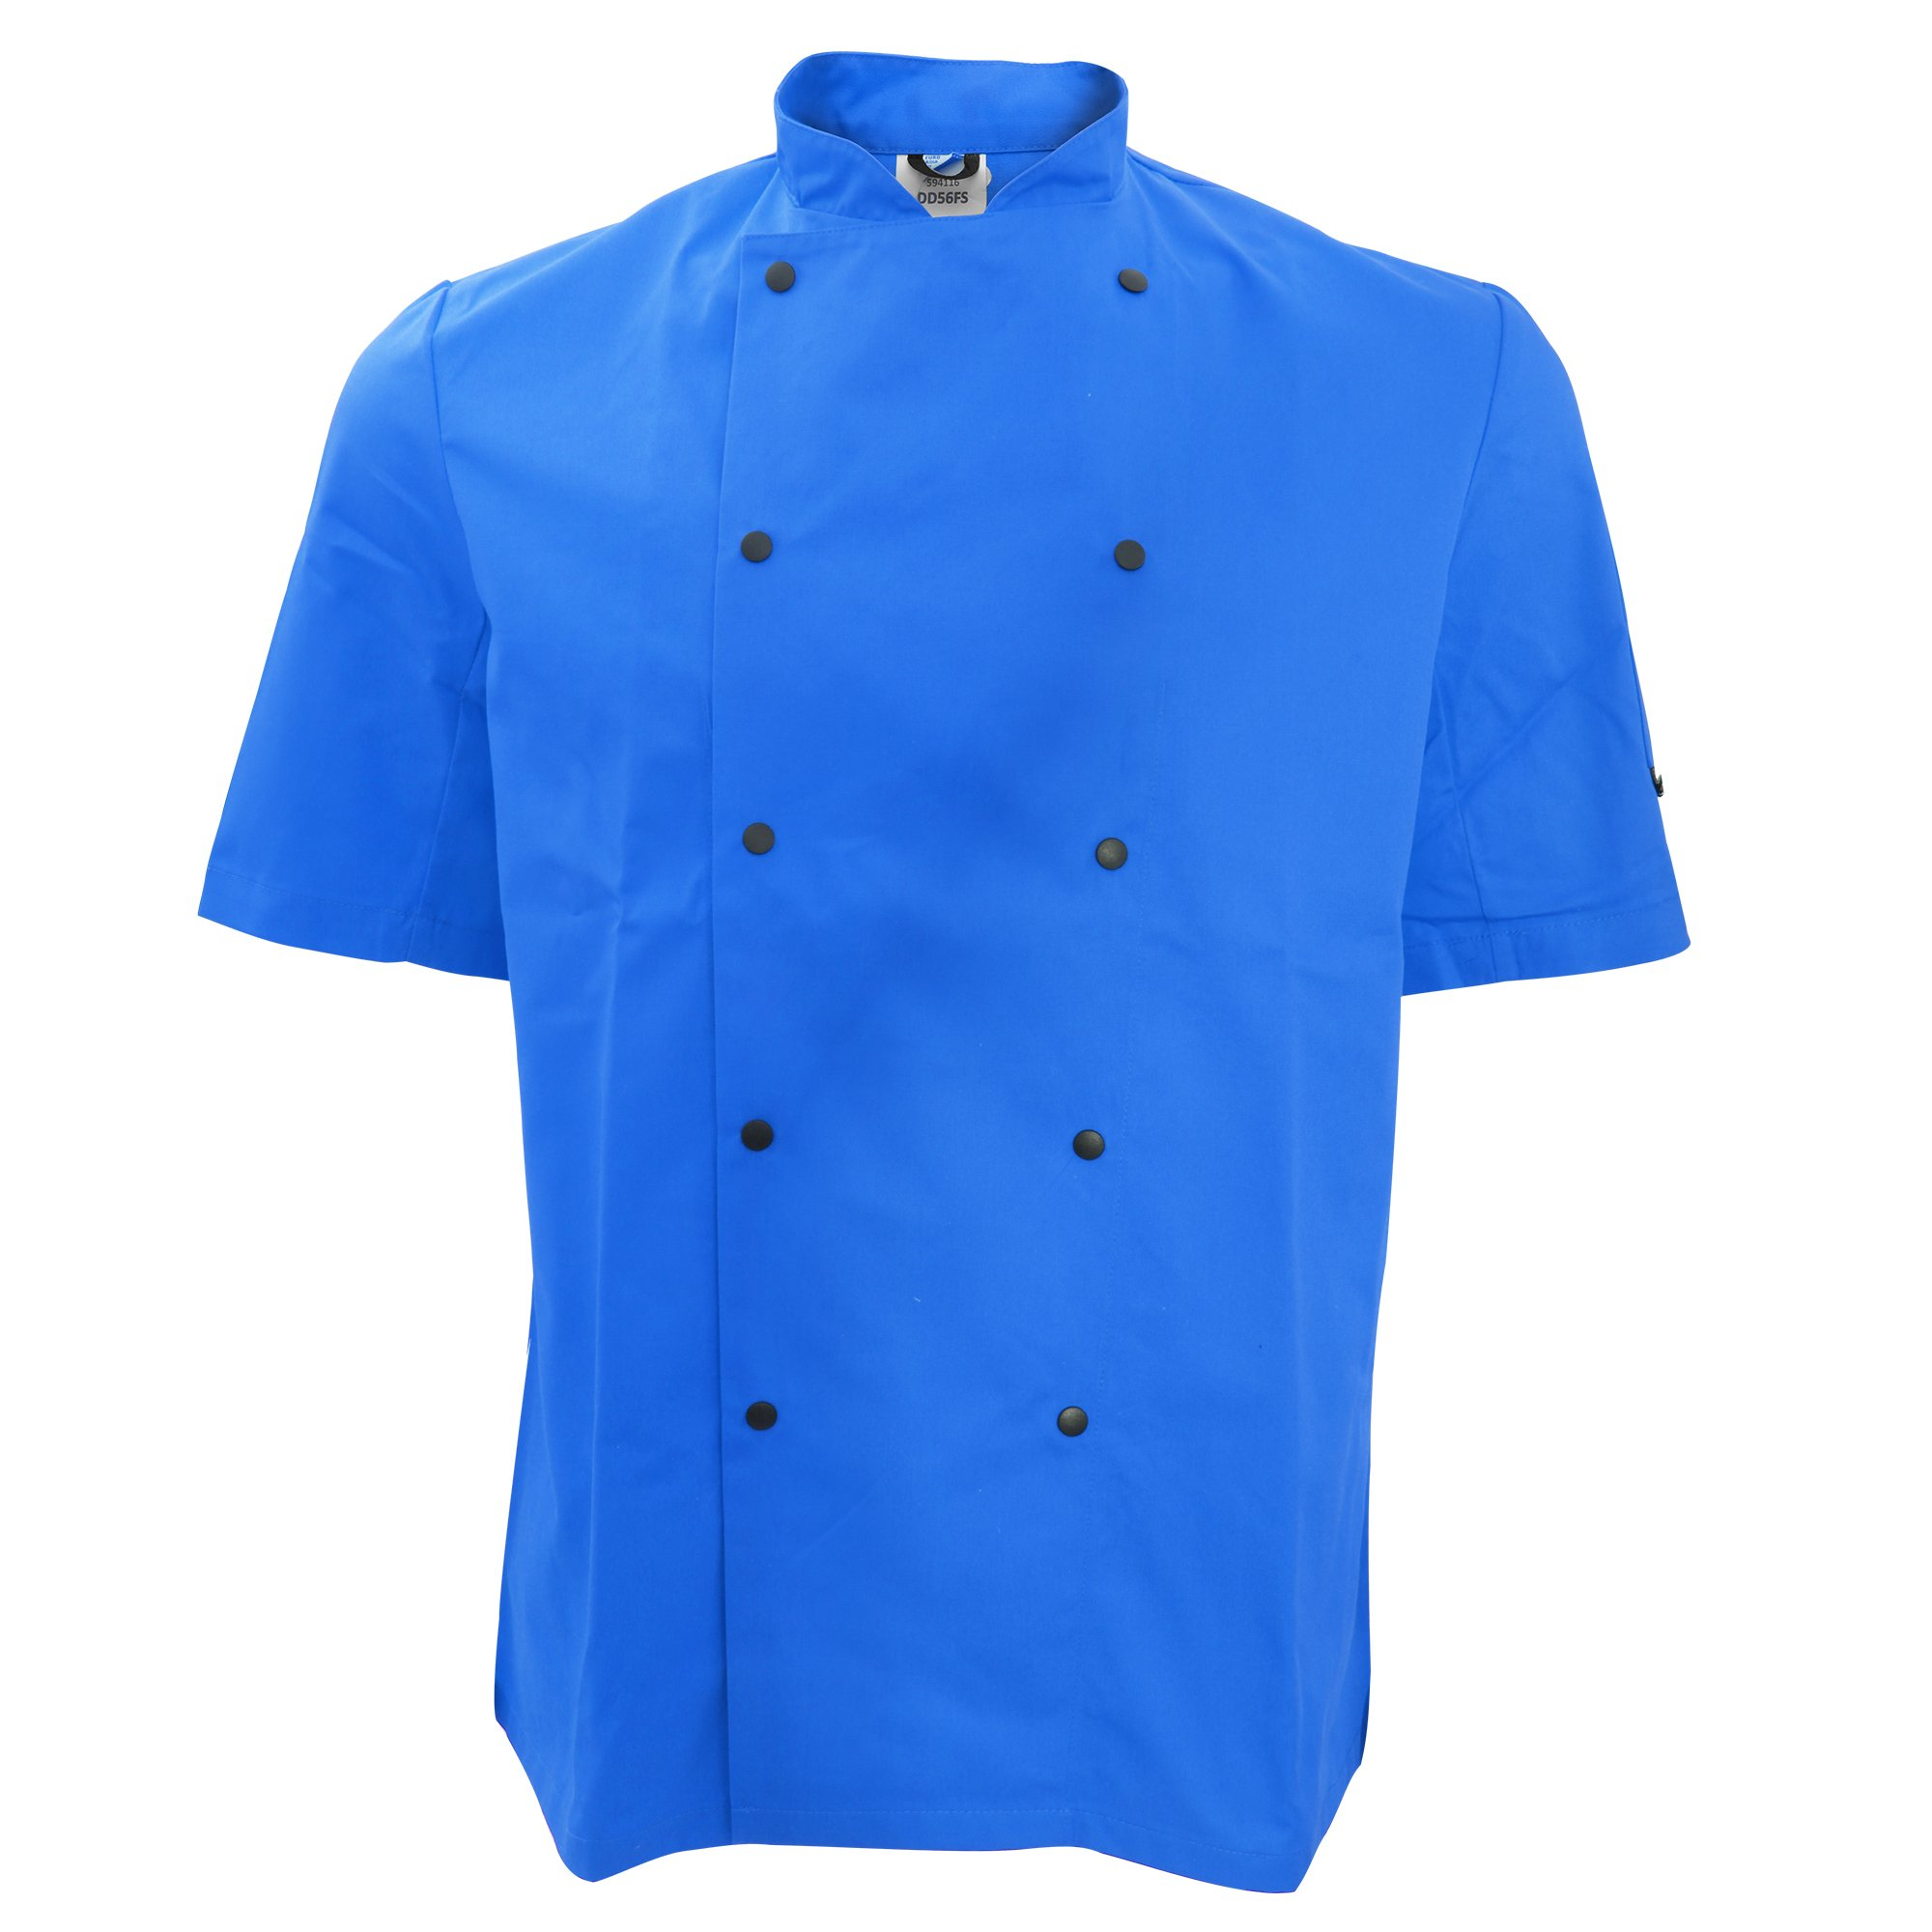 Dennys Unisex Short Sleeve Stud Button Chef Jacket (2XL) (Royal) by Denny's